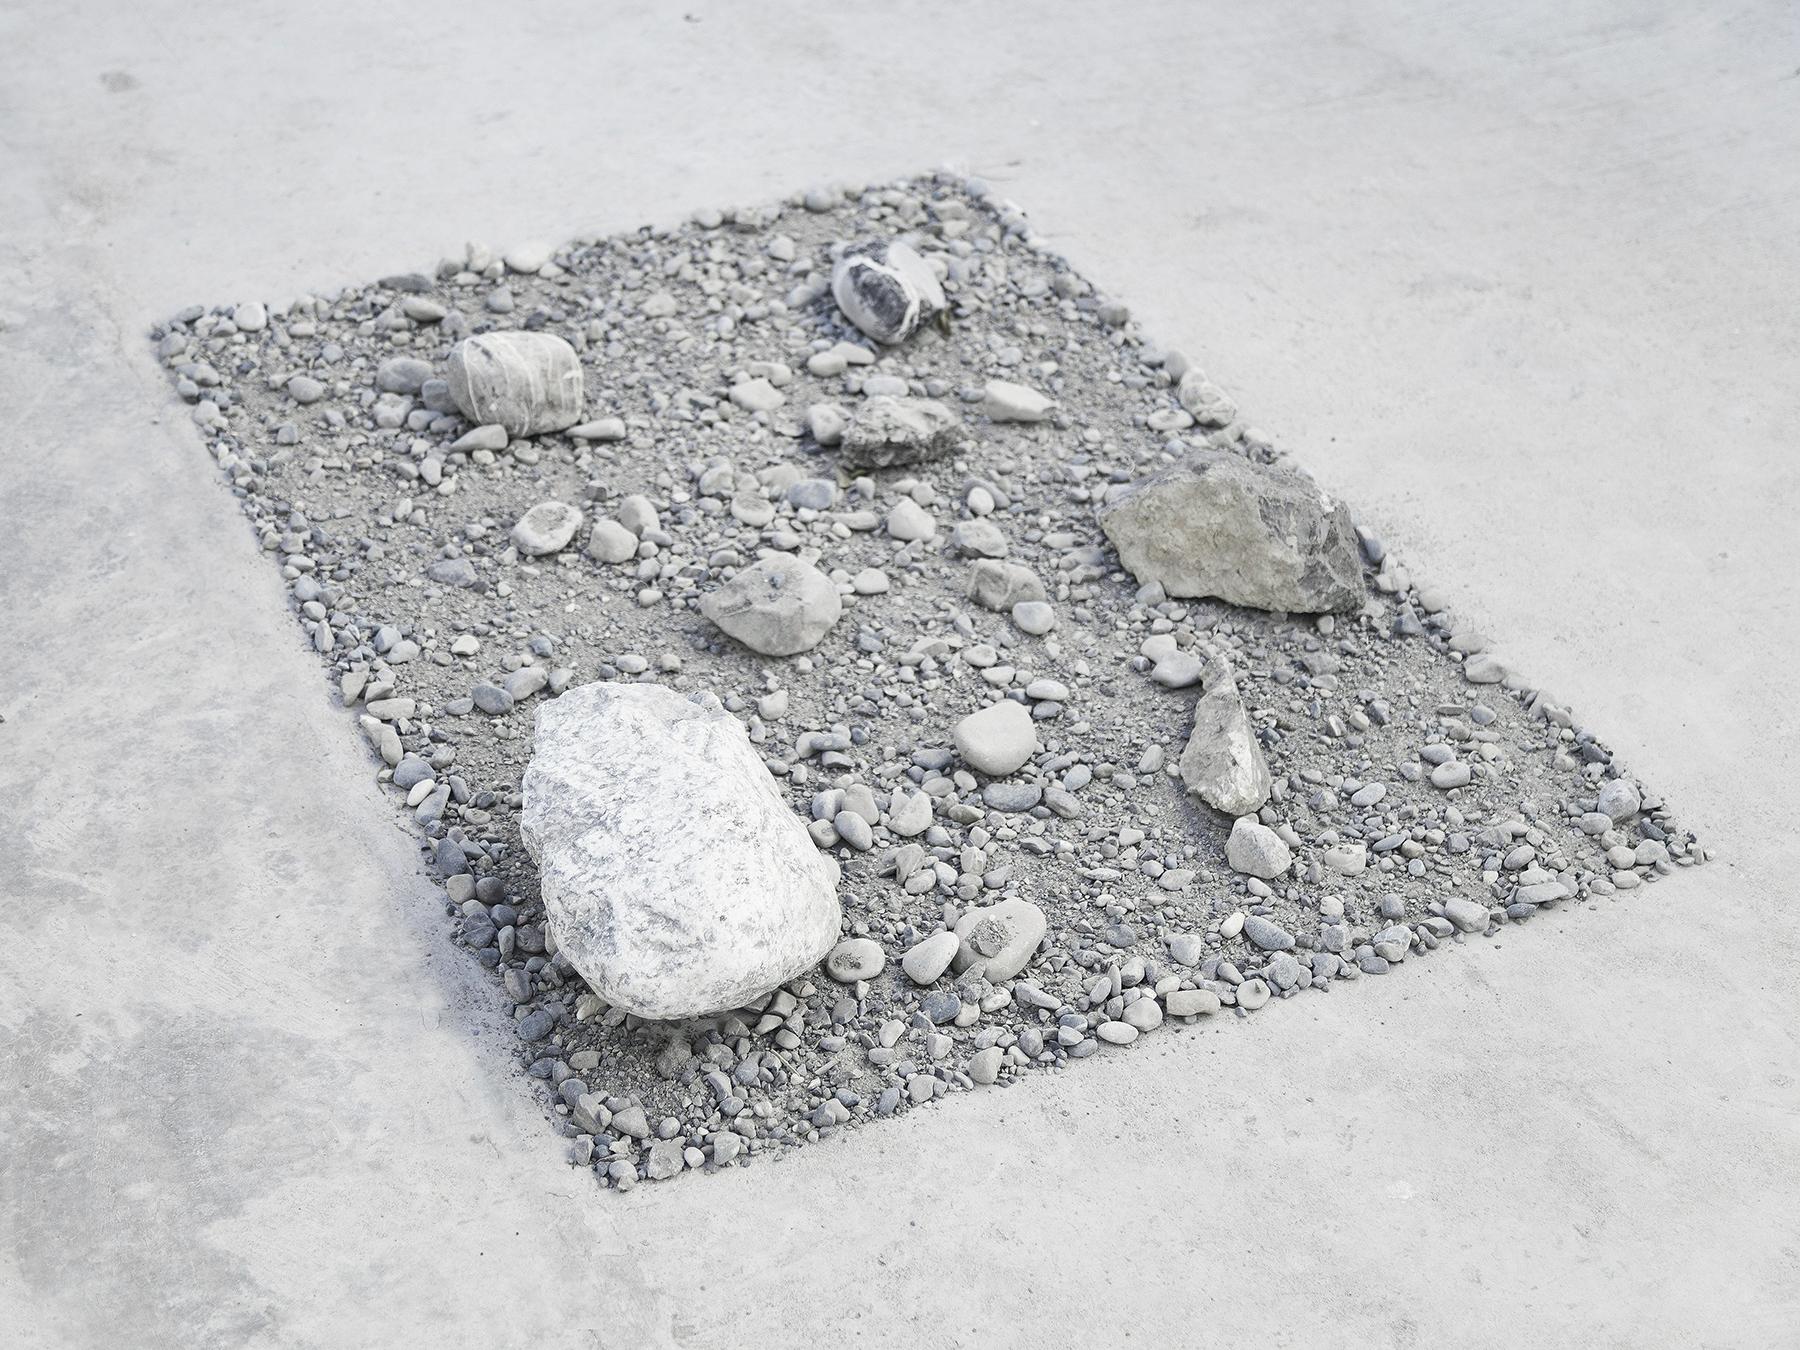 alessandro moroder   untitled   rocks, sand, dirt  variable dimensions  2016